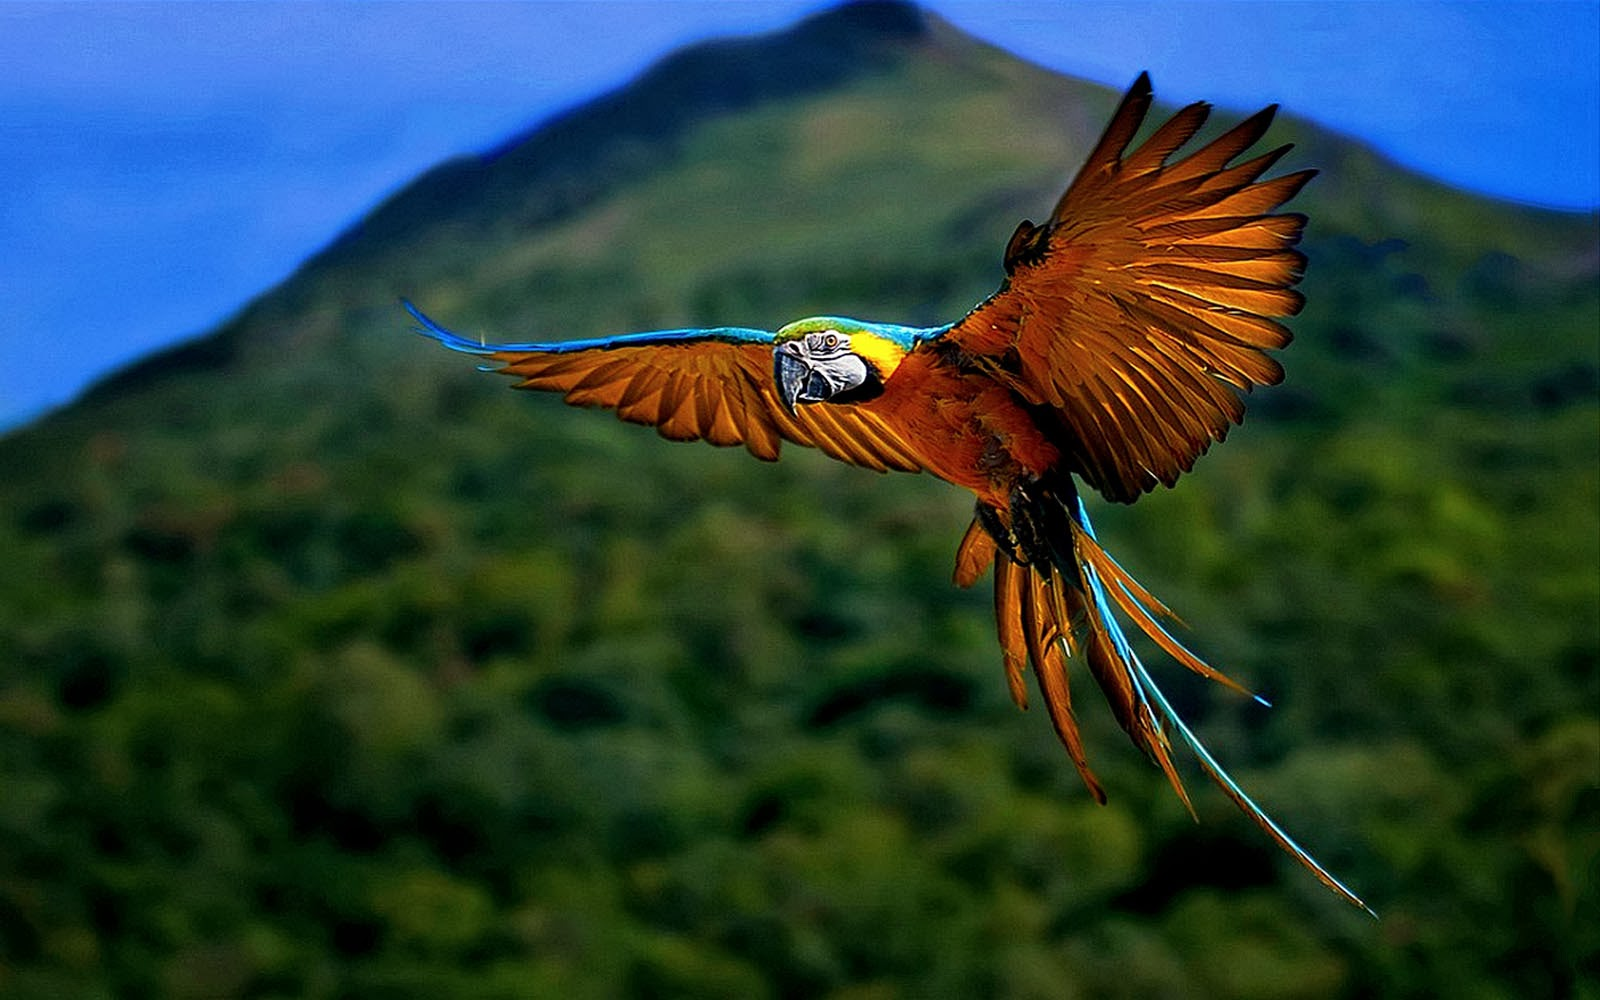 Wallpapers macaw bird wallpapers - Hd birds images download ...